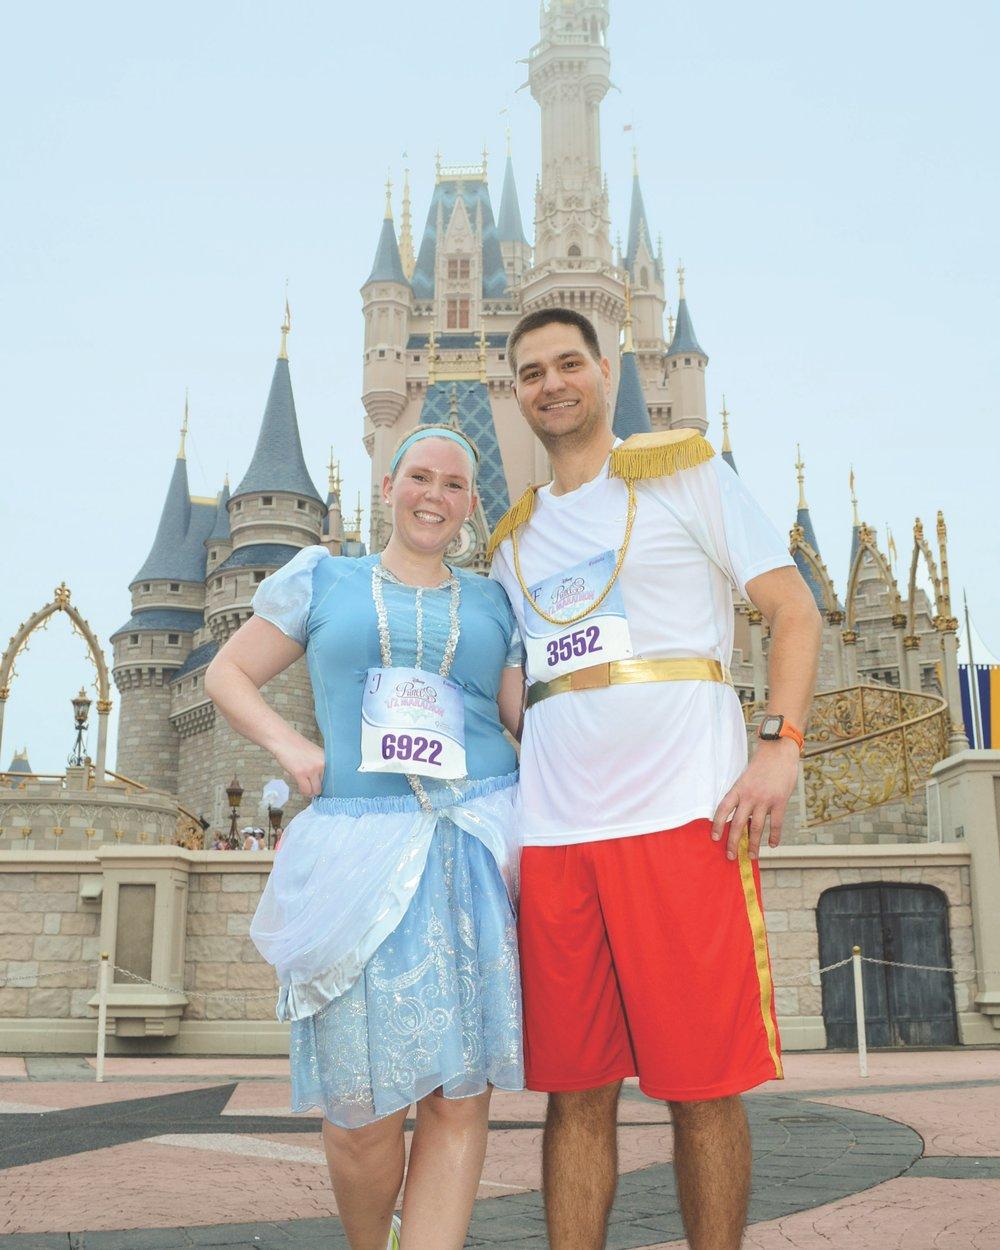 Running the Princess Half Marathon.